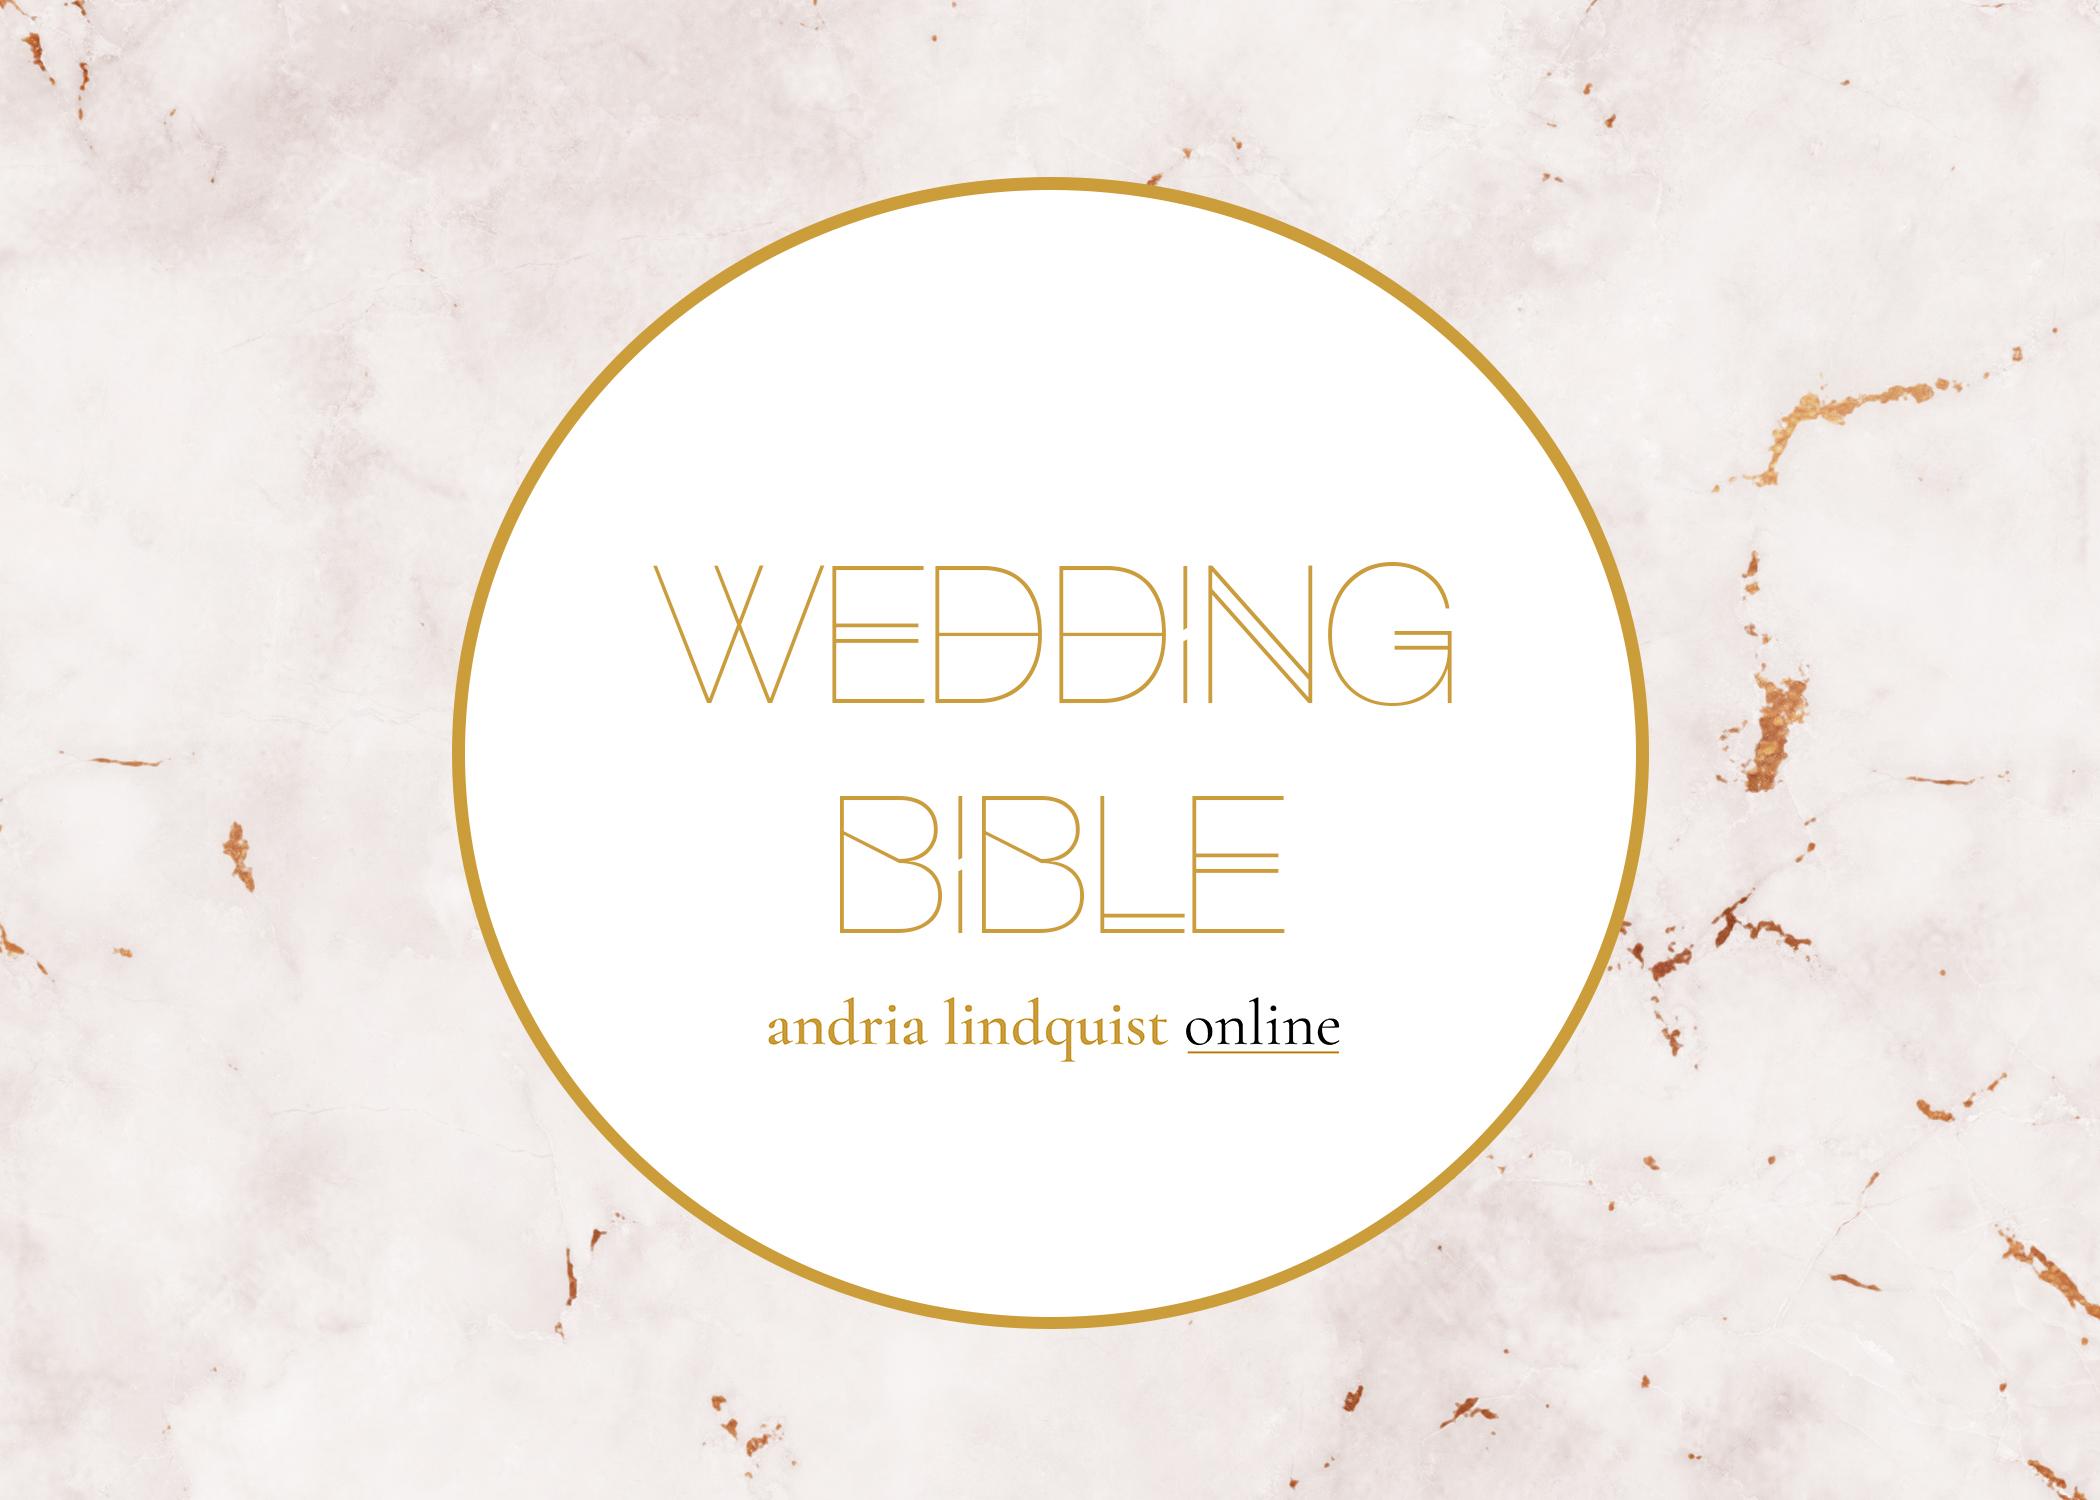 WeddingBible2.jpg